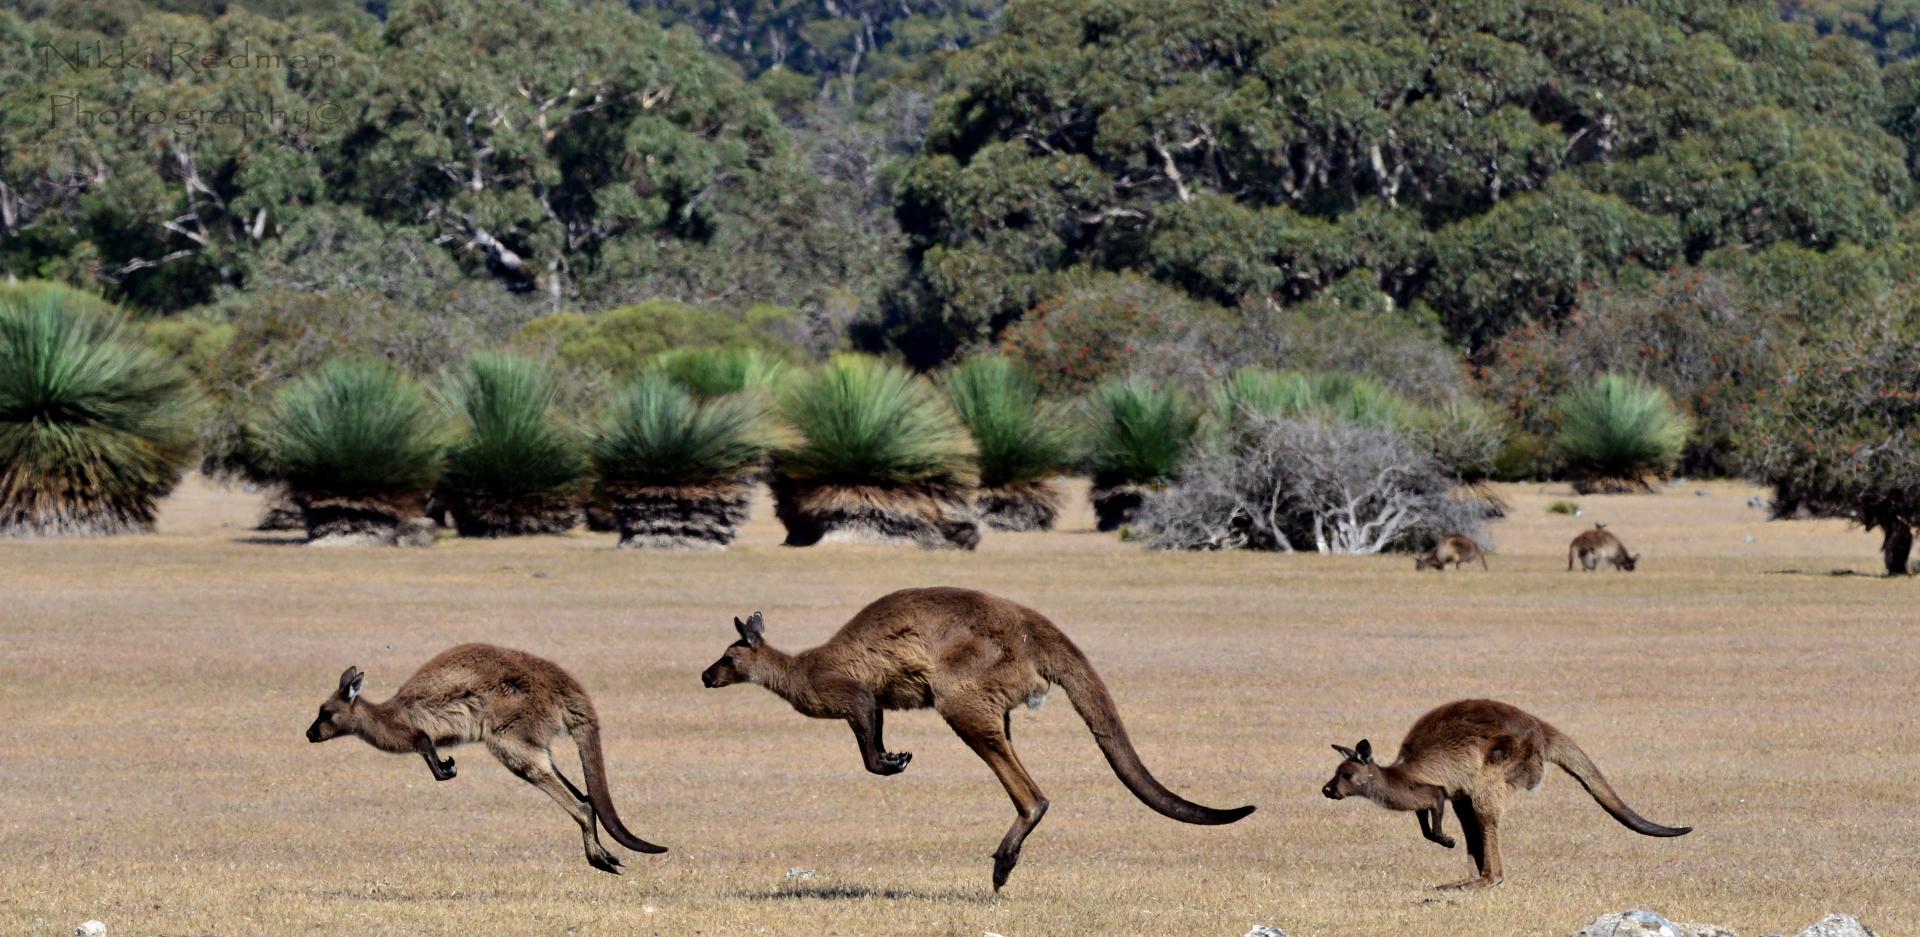 Kangaroo Island Kangaroo Mob